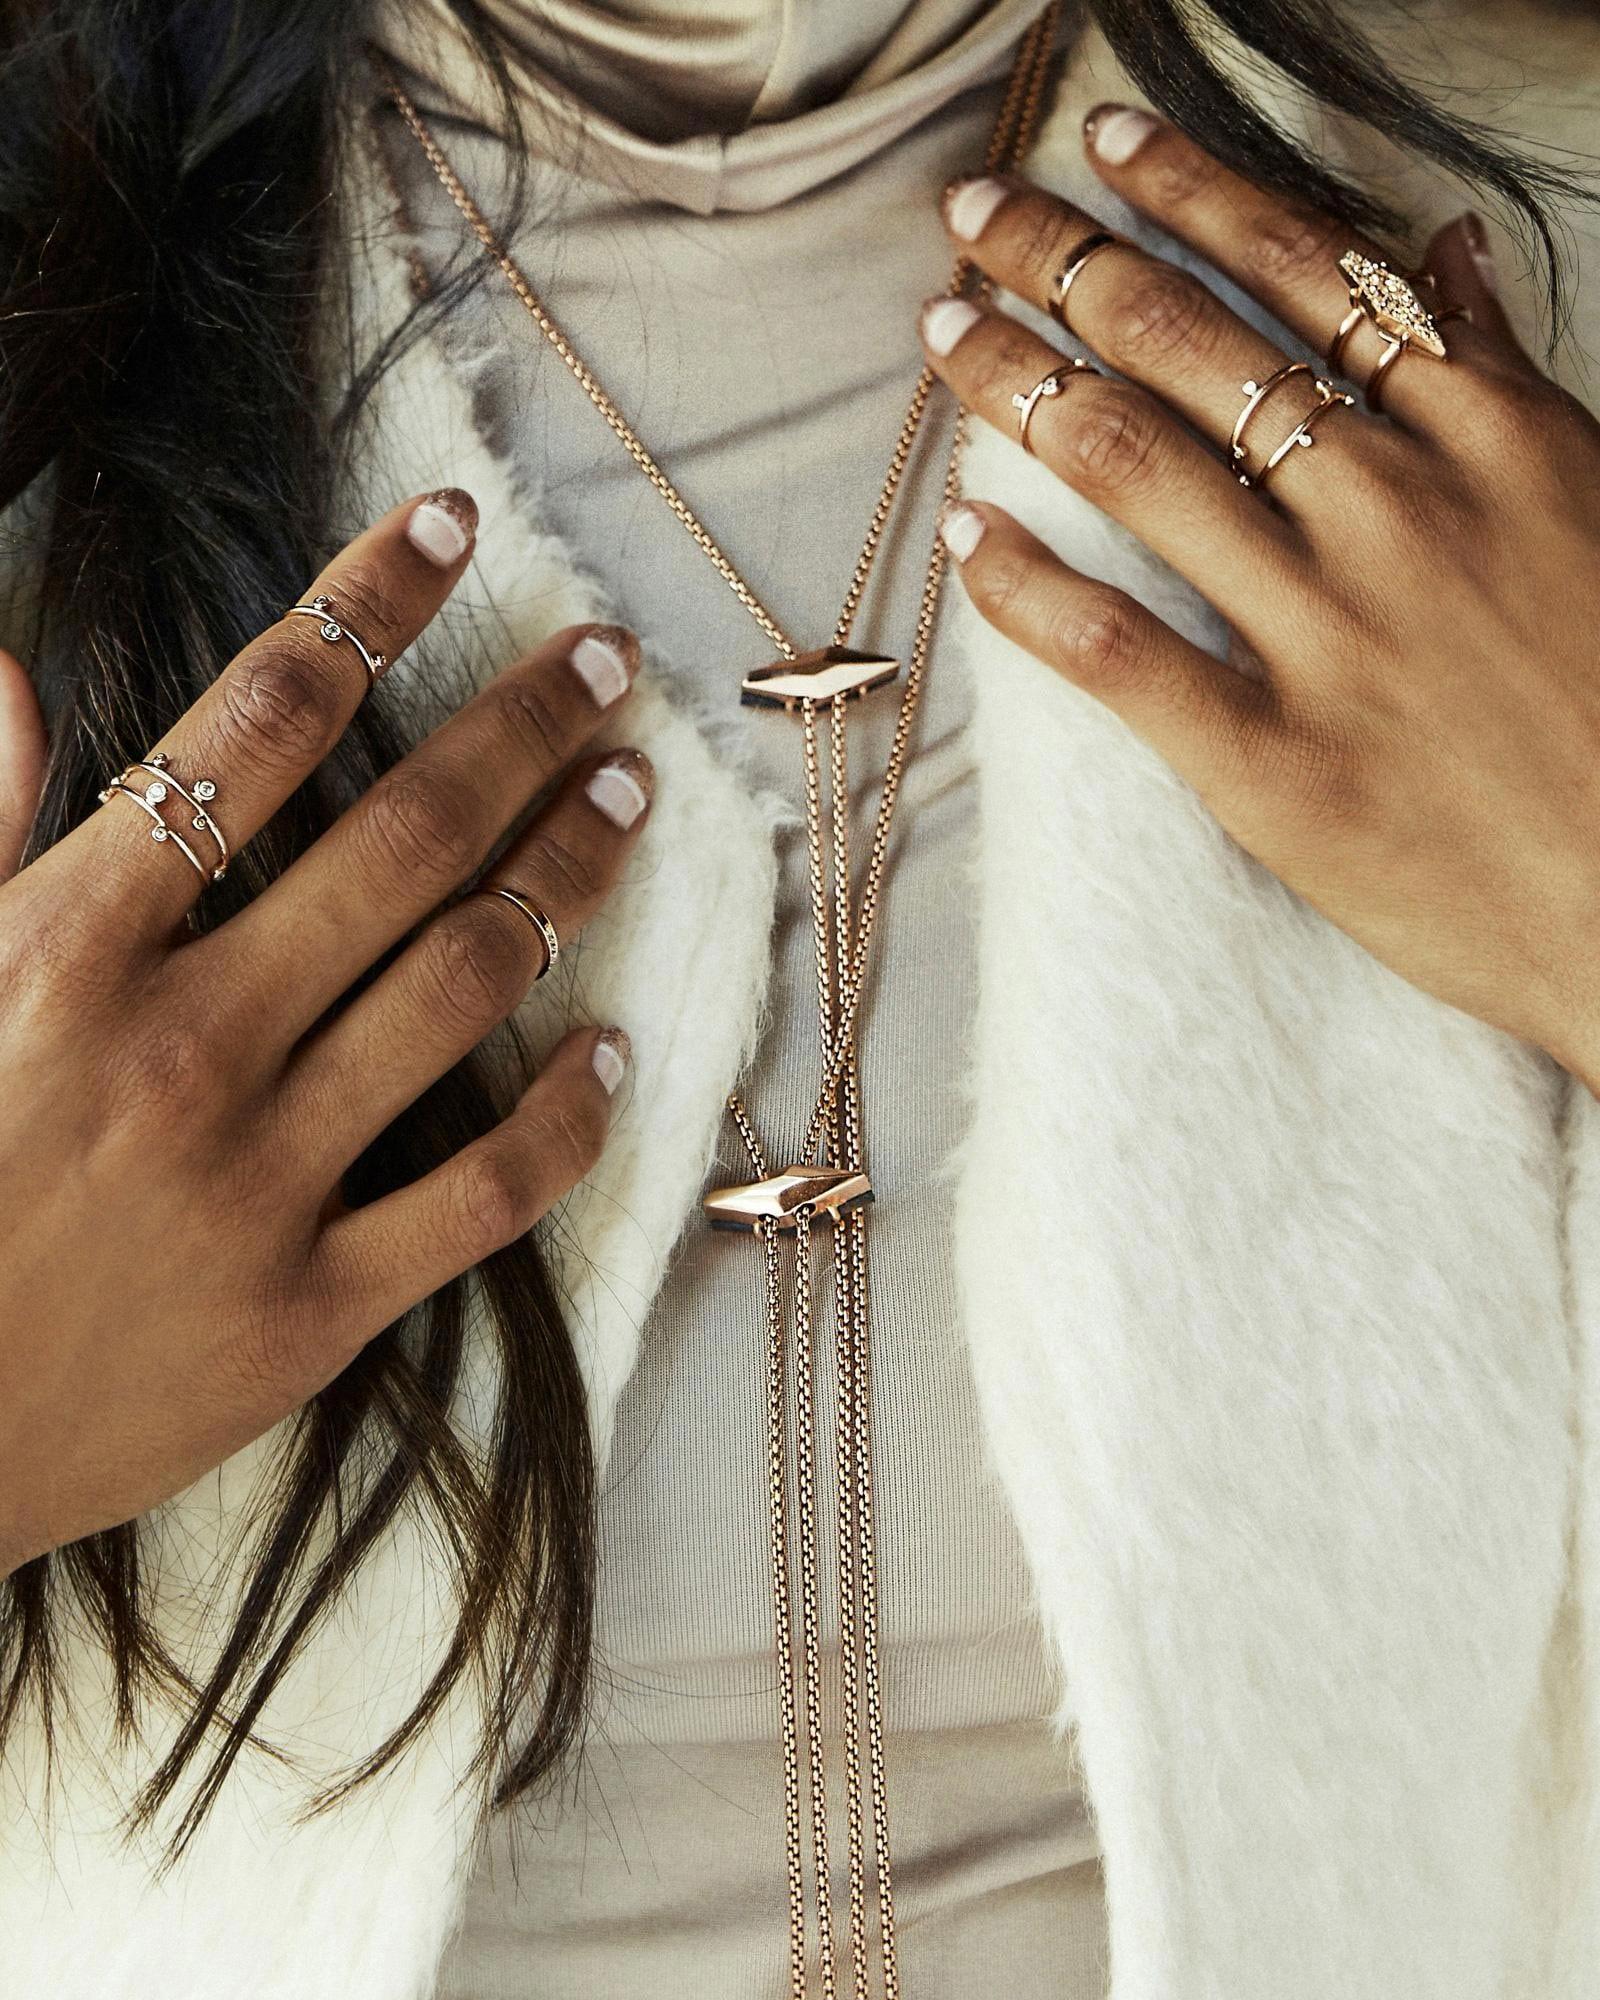 bolo jewelry